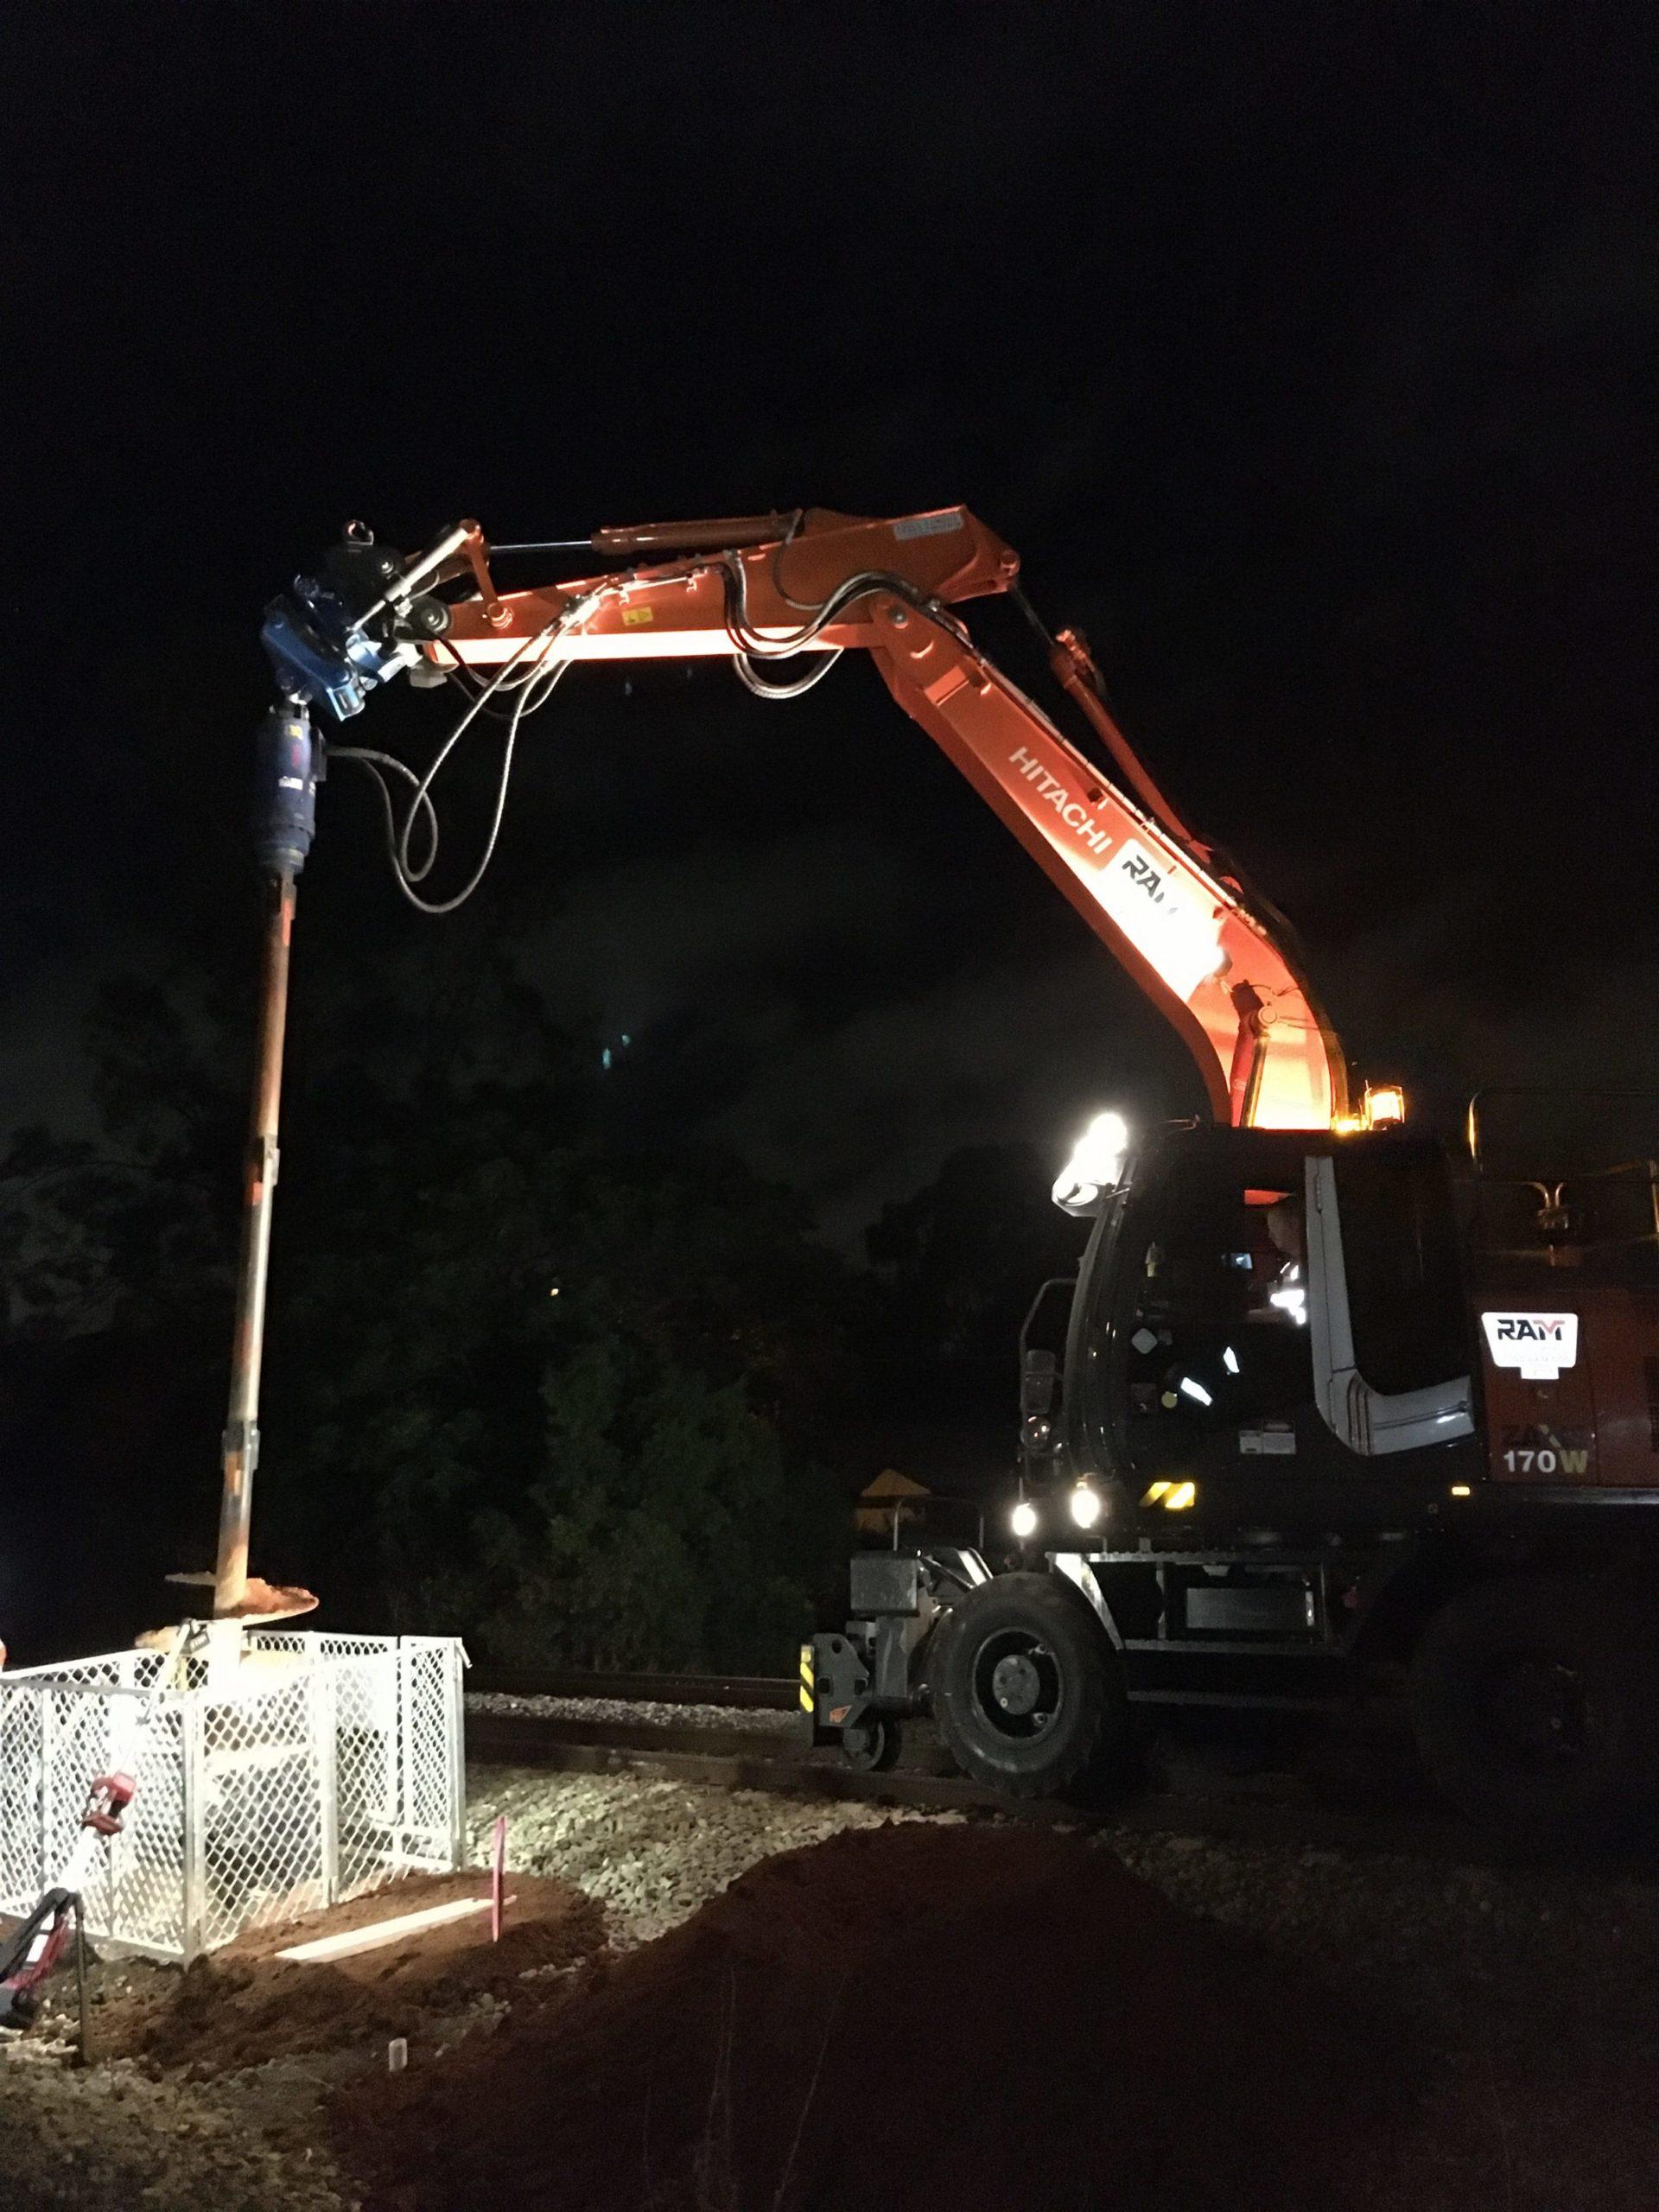 RAM Gawler Line Hi-Rail Excavator